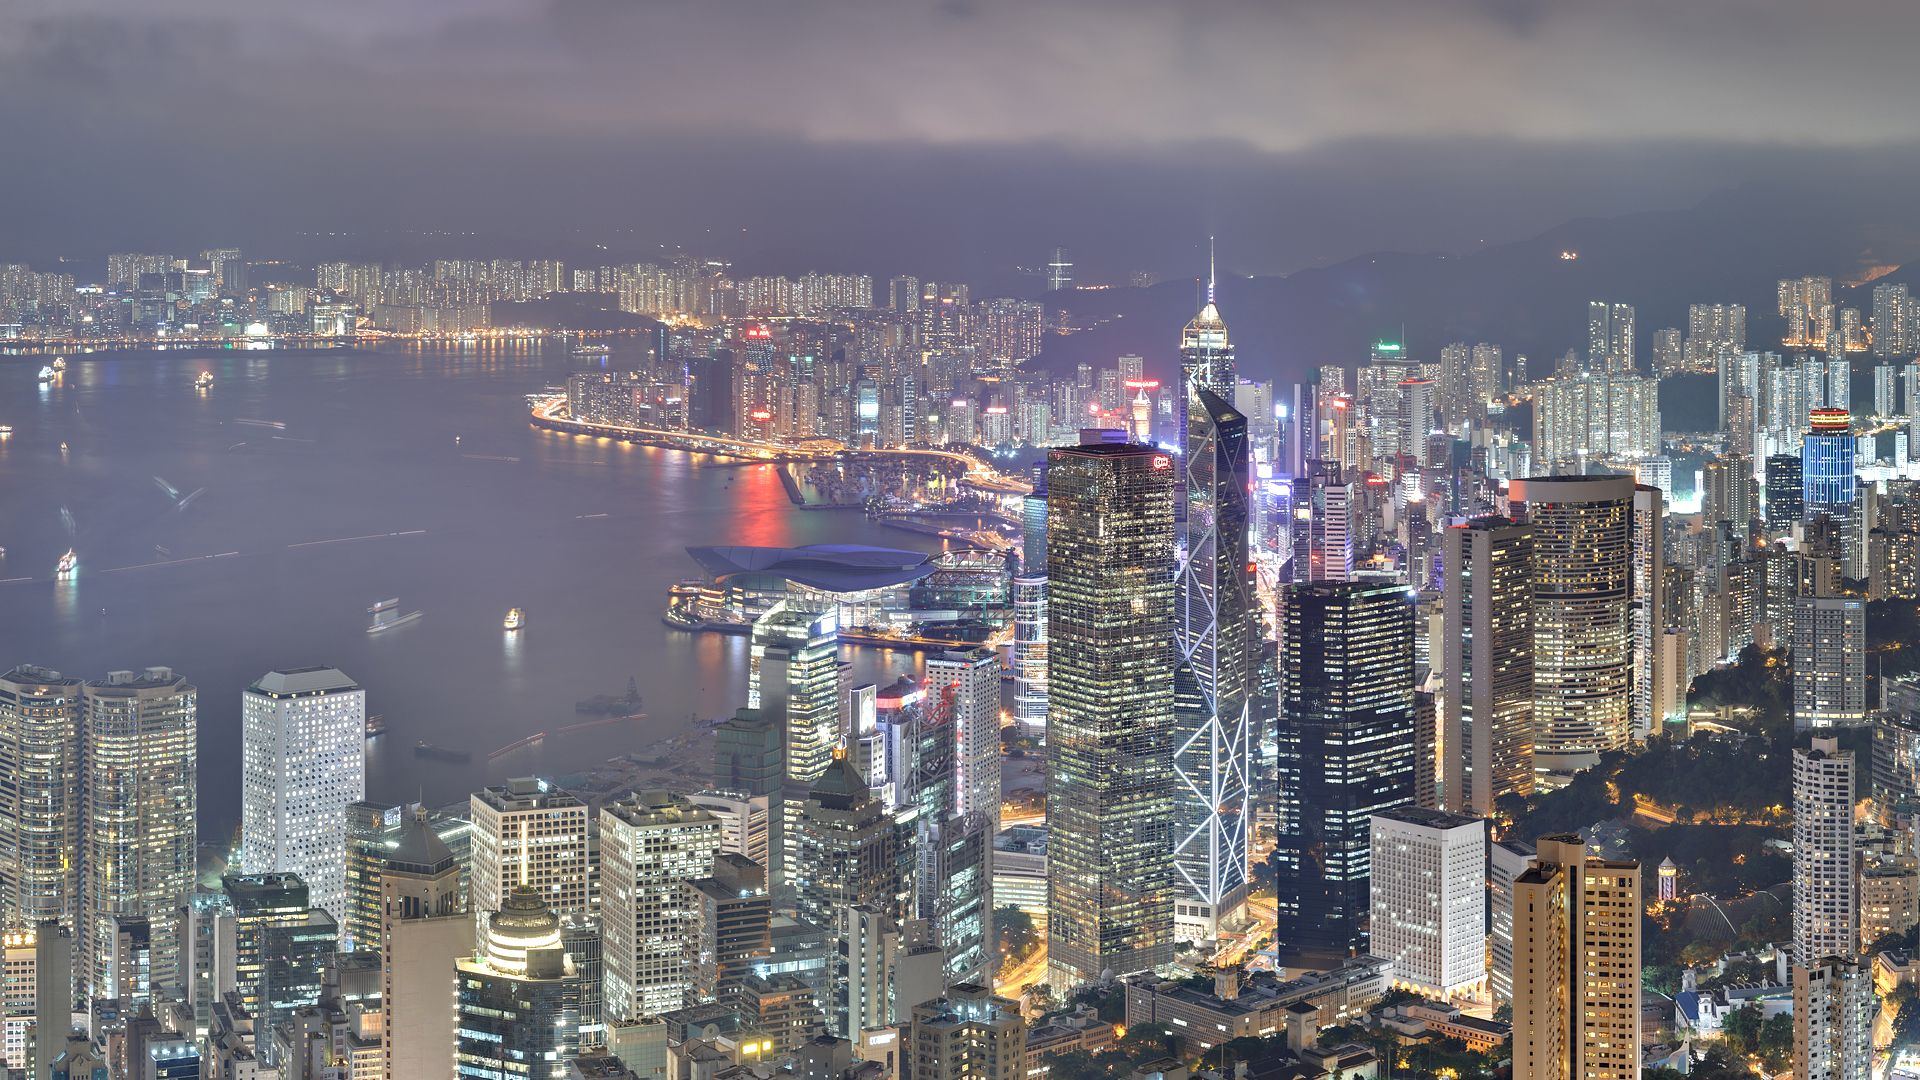 Hong Kong Scenery Wallpapers Top Free Hong Kong Scenery